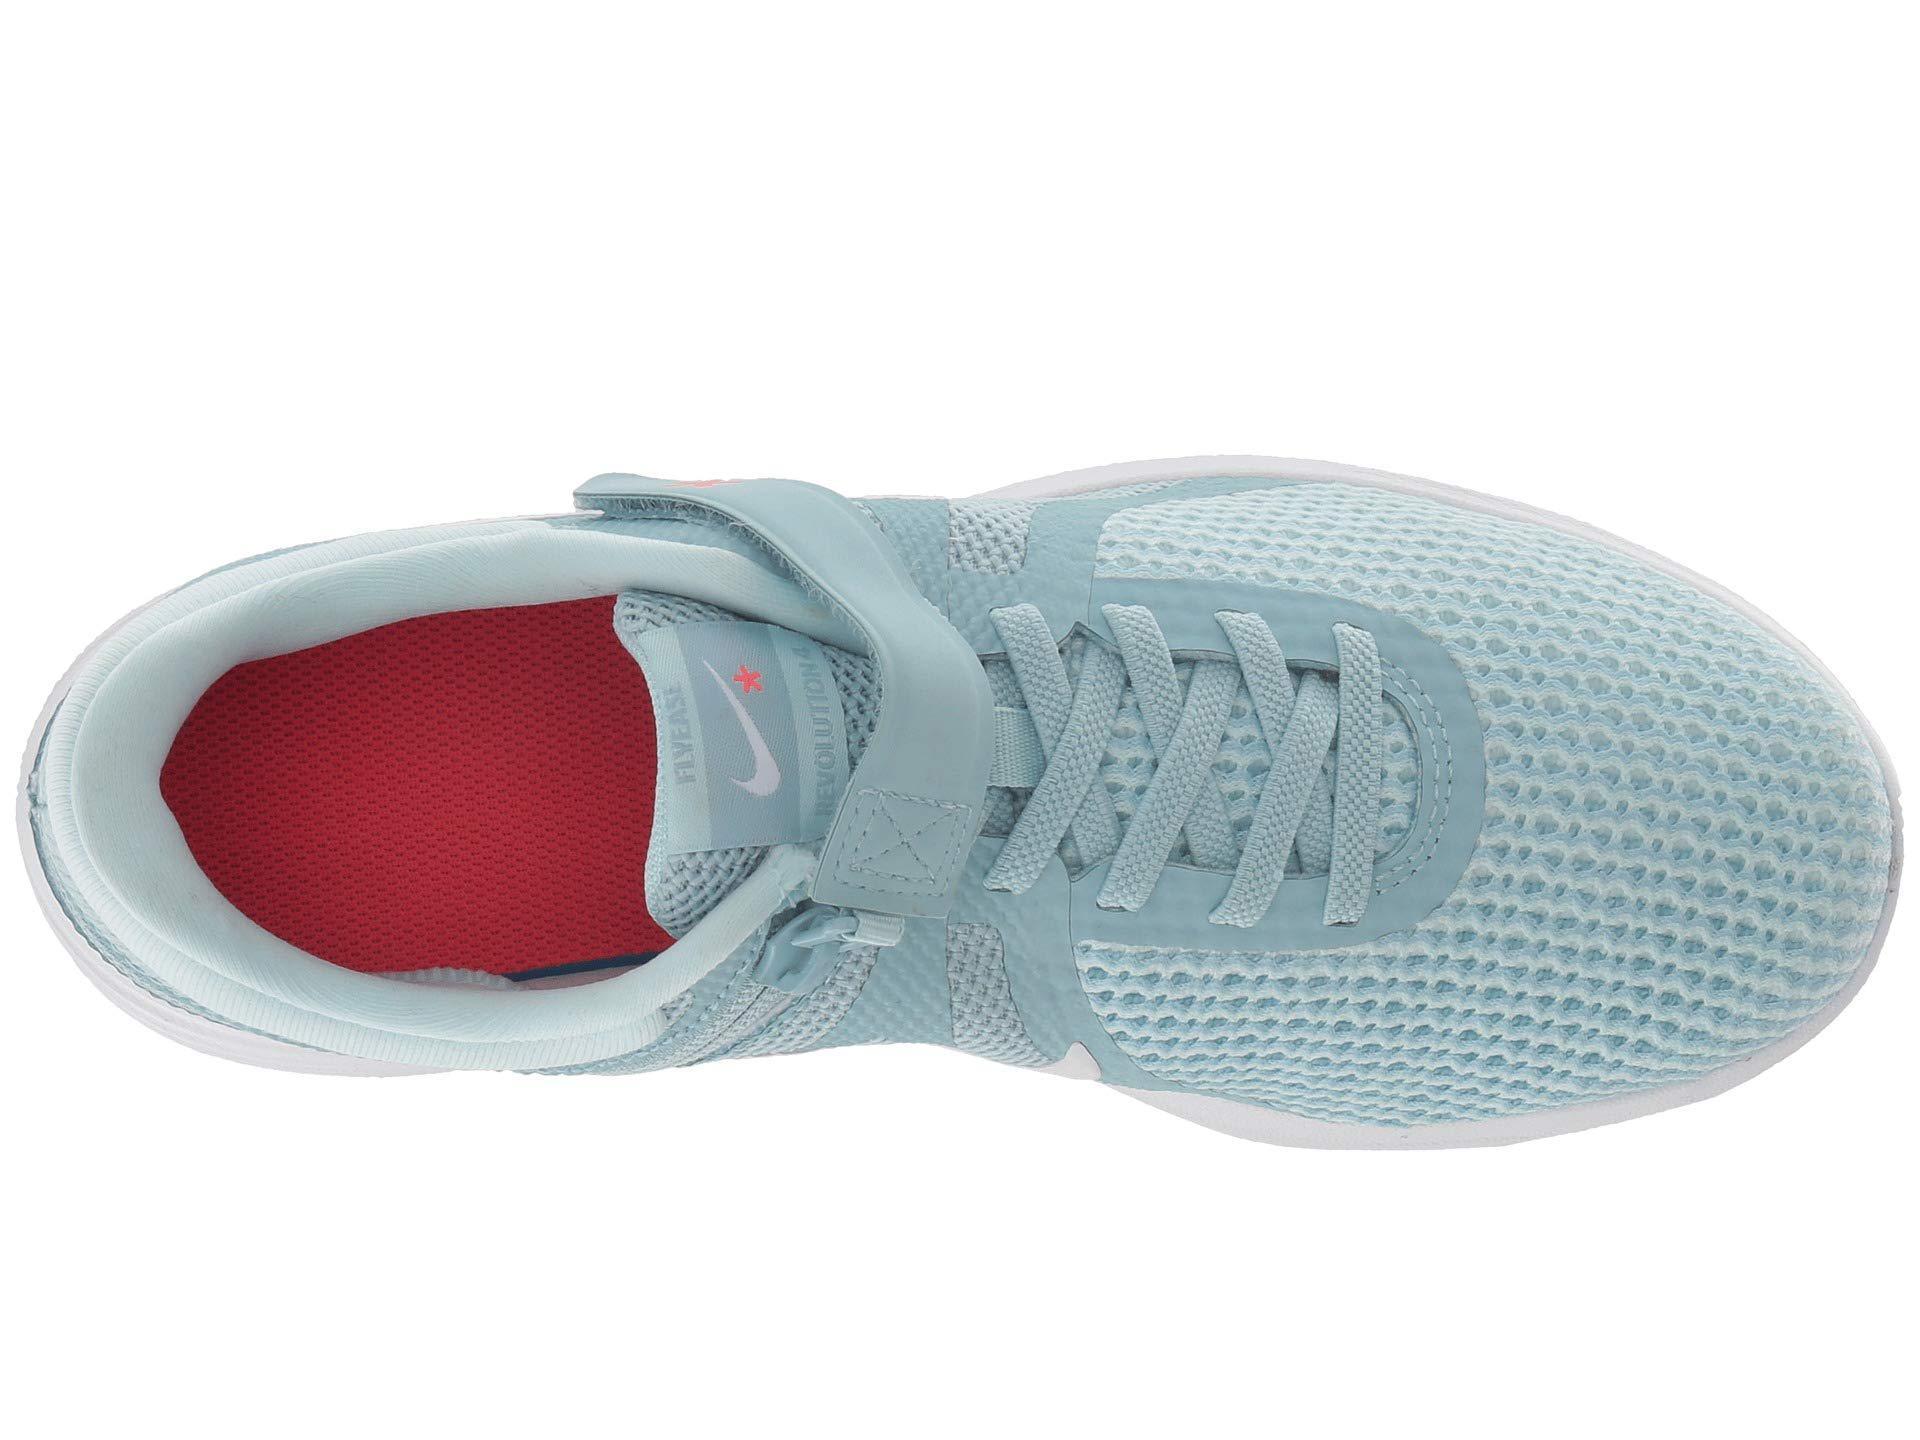 wholesale dealer 57d33 b0287 Lyst - Nike Revolution 4 Flyease (ocean Blisswhiteglacier Bl